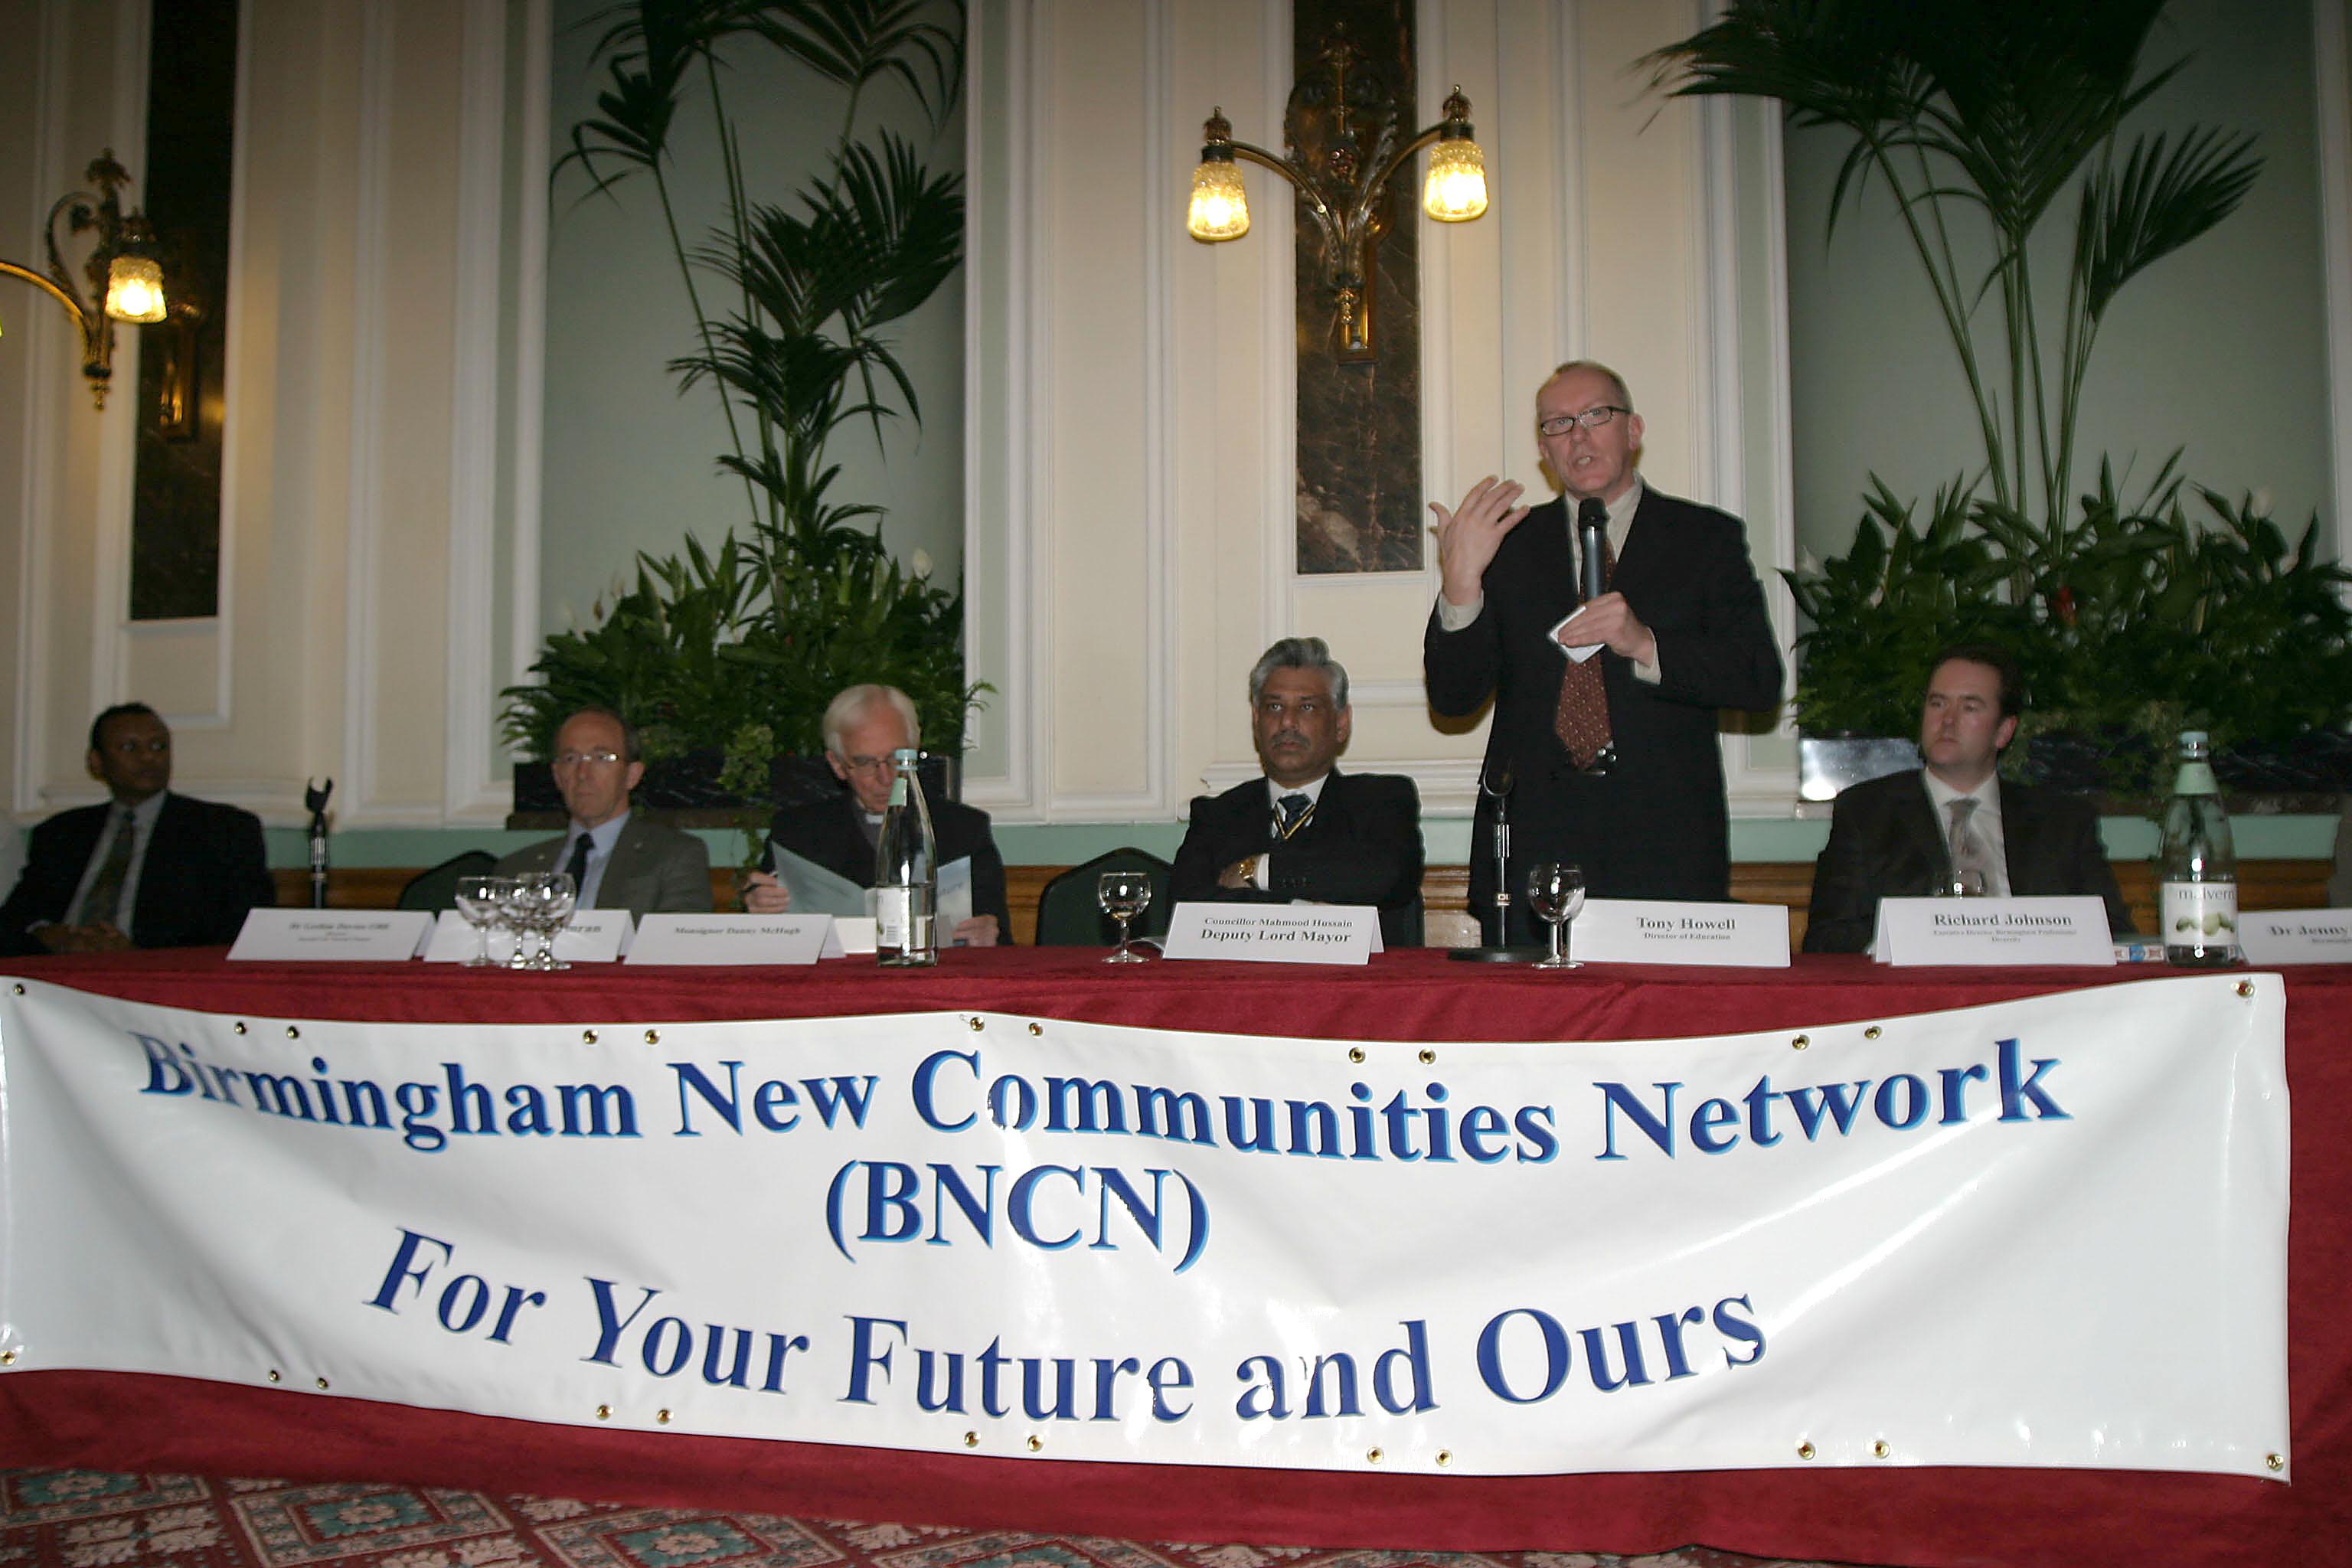 Launch of the Birmingham New Communities Network